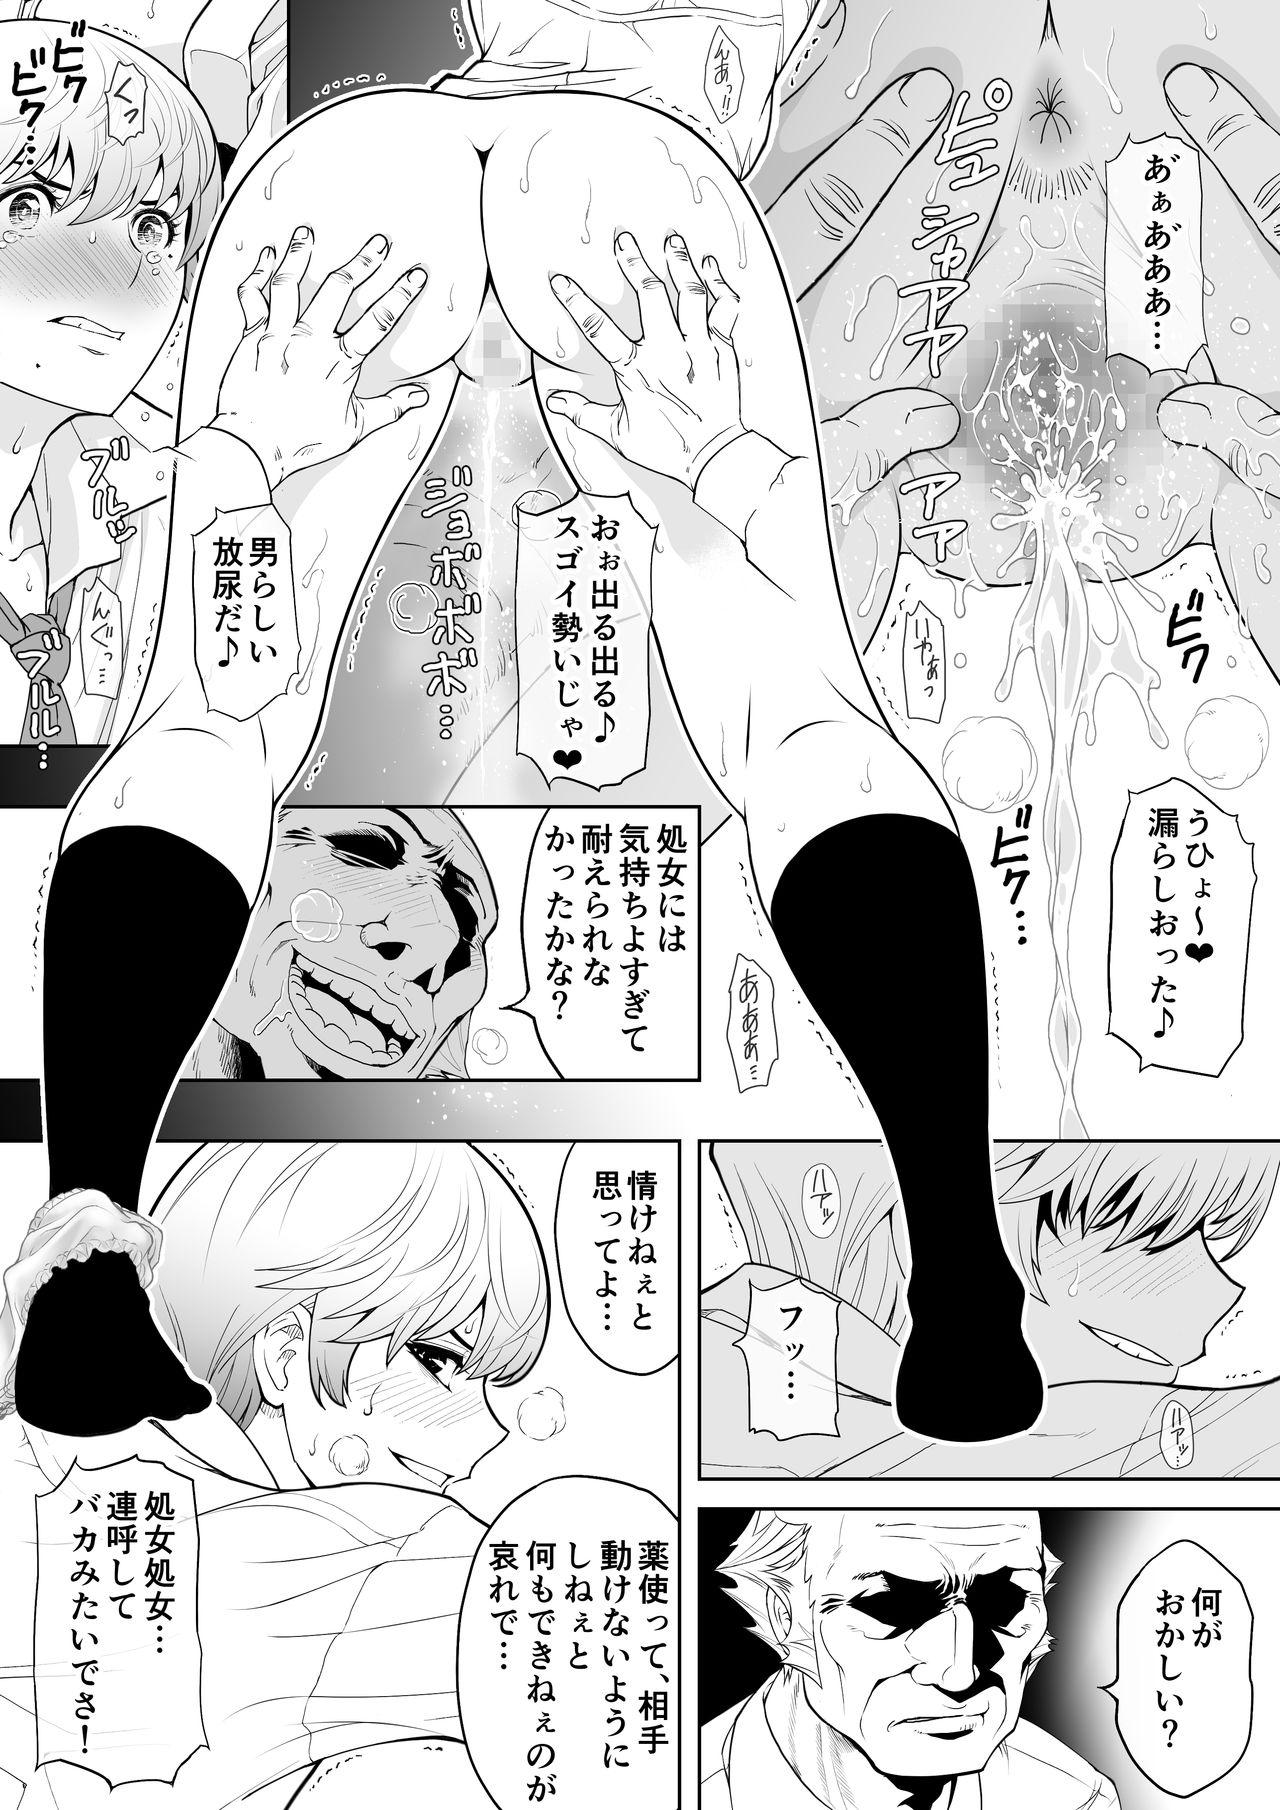 Namaiki mmusume ni tsuyo ● ikīki jugyō 16